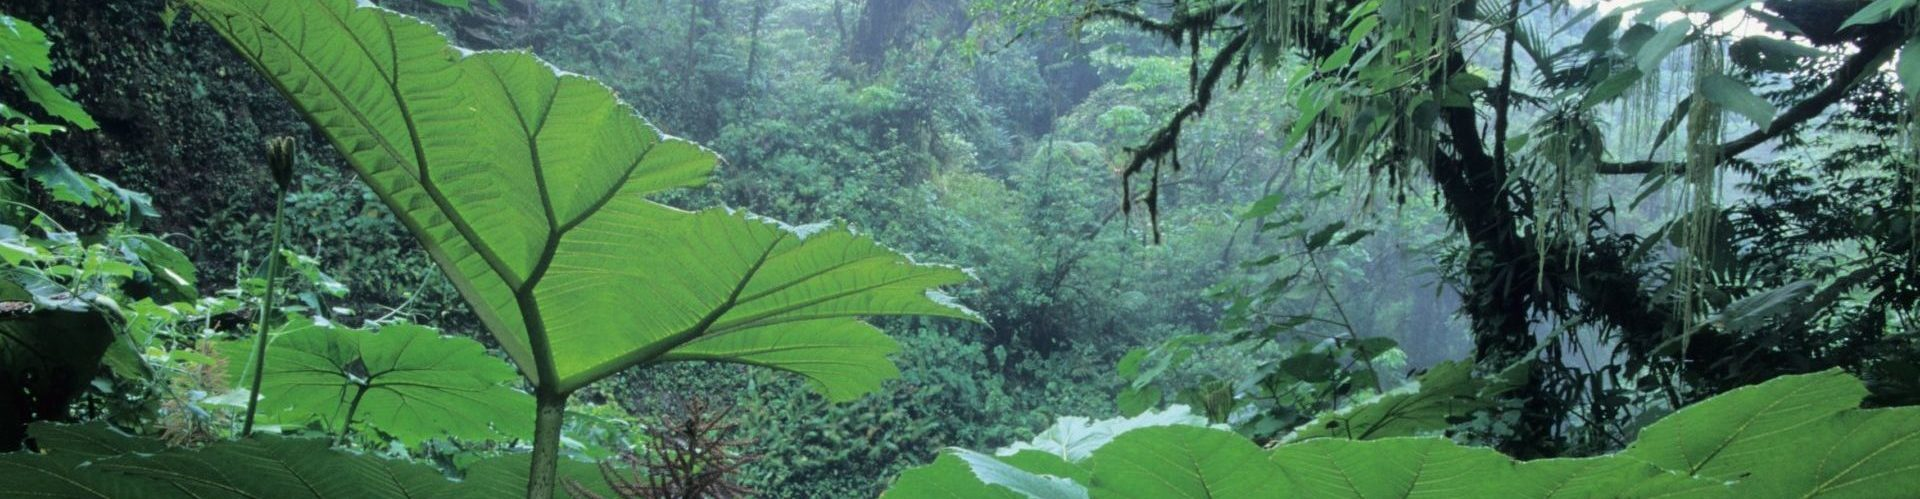 Costa Rica, Monteverde Nebelwald, Latin America Tours, Reisen